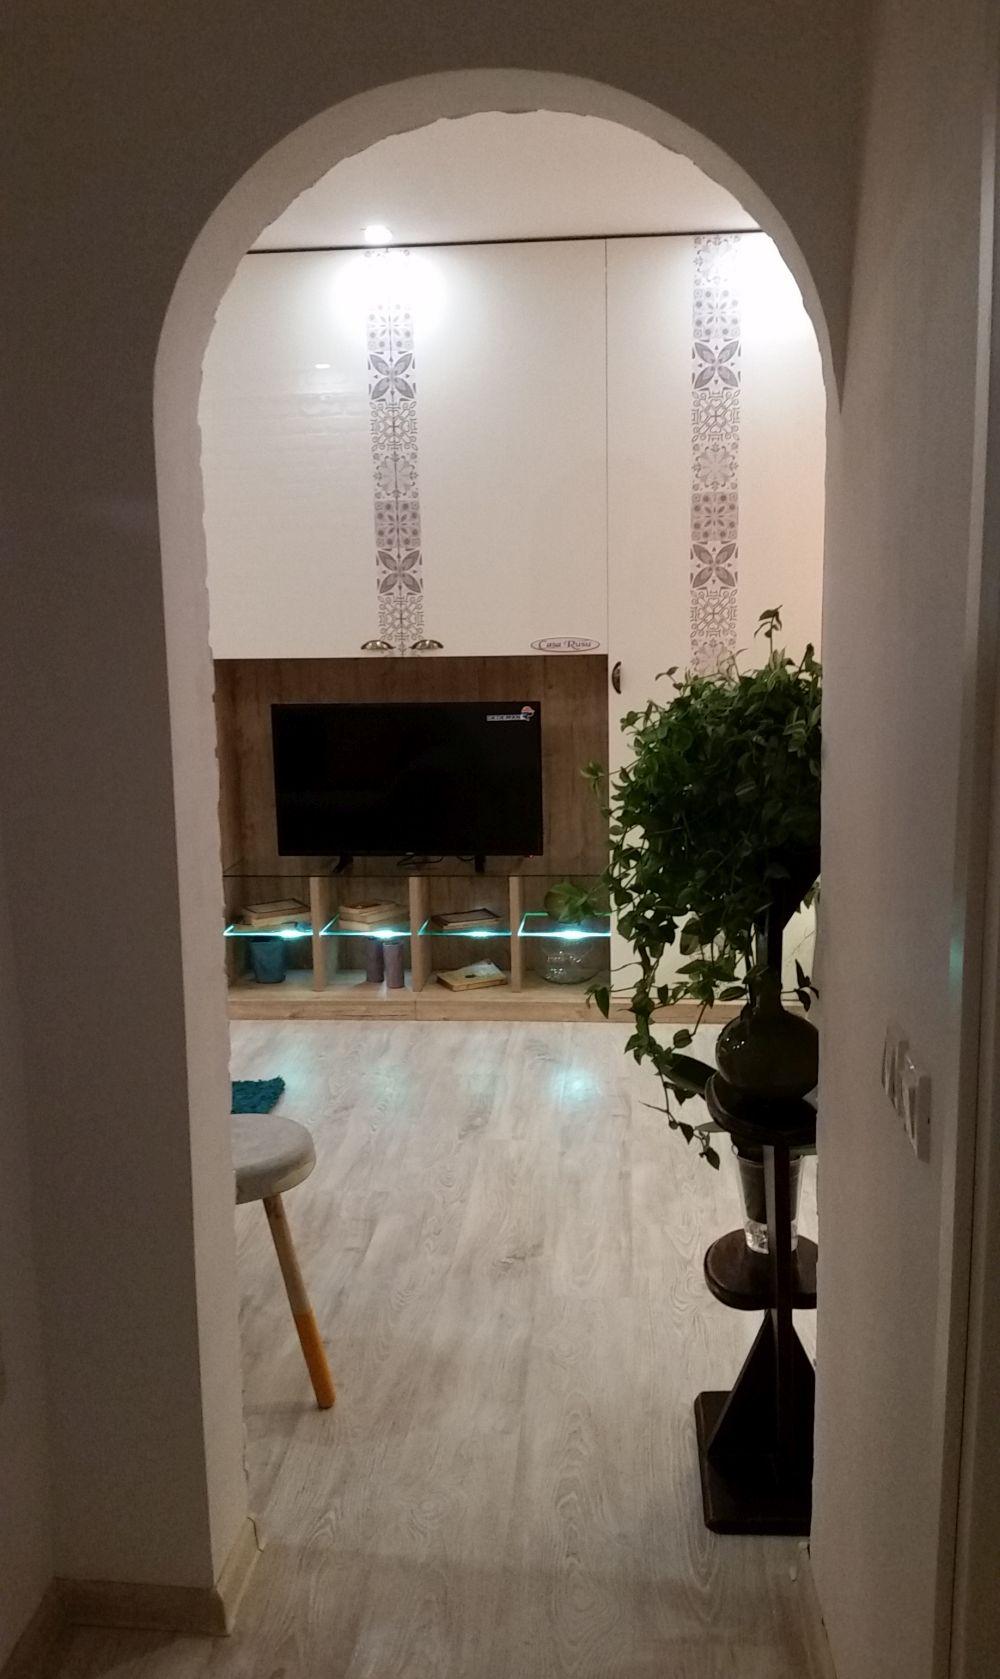 adelaparvu-com-despre-apartamentul-familiei-tudorache-ploiesti-episodul-9-sezonul-3-visuri-la-cheie-foto-adela-parvu-6